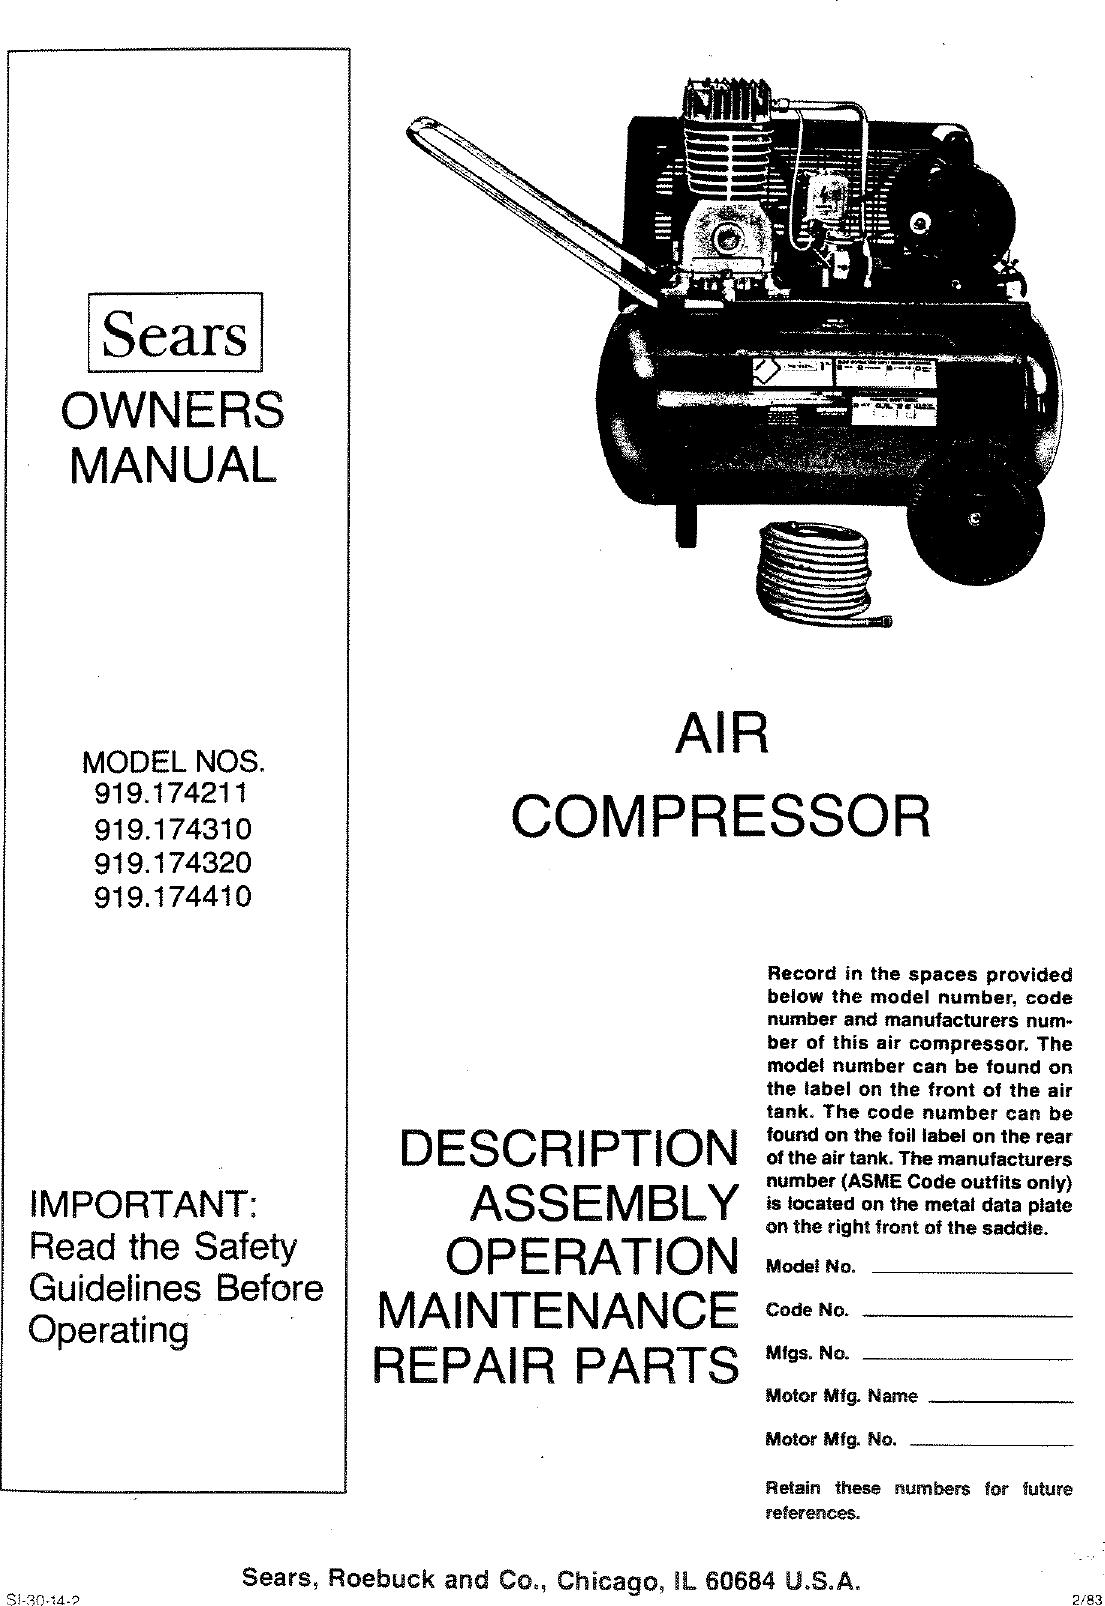 Craftsman 919174211 User Manual Air Compressor Manuals And Guides L0807612